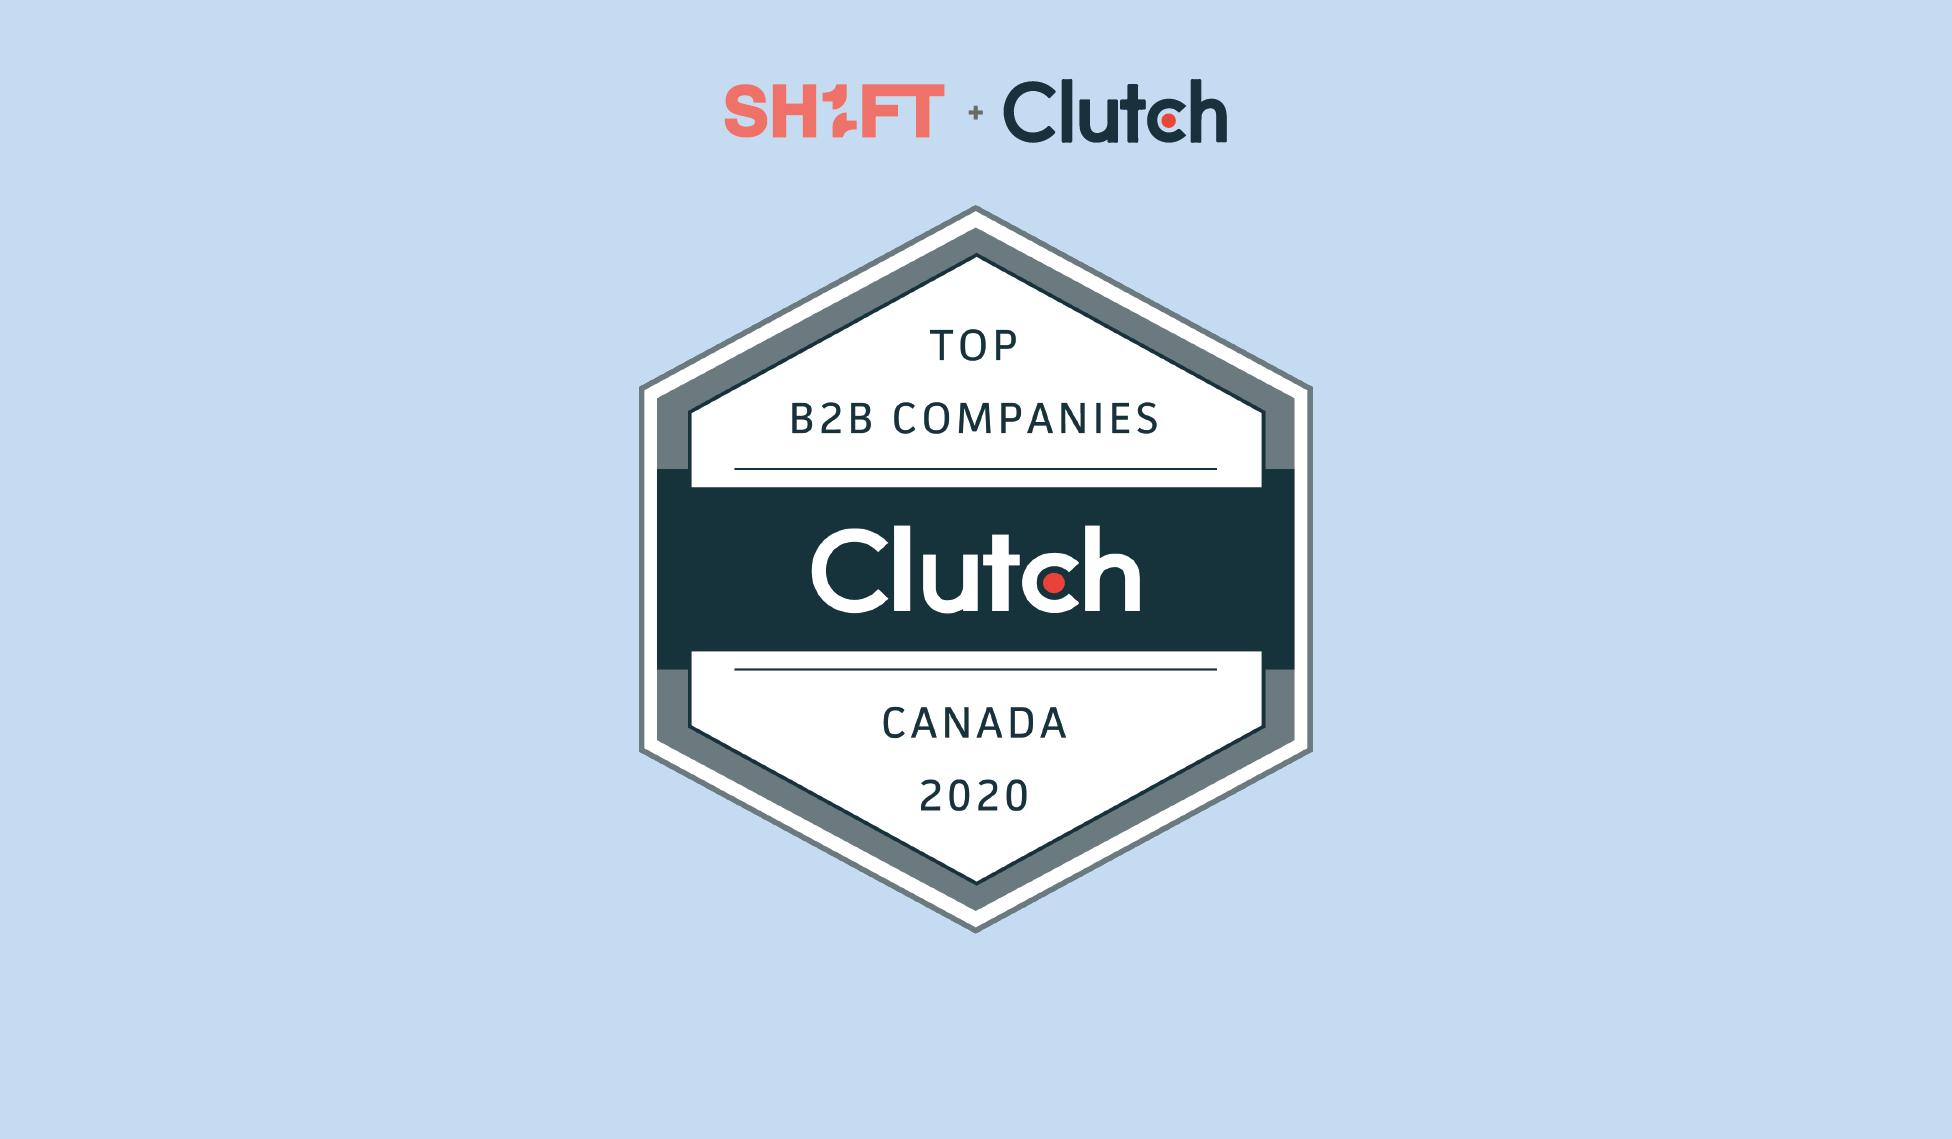 sh1ft clutch